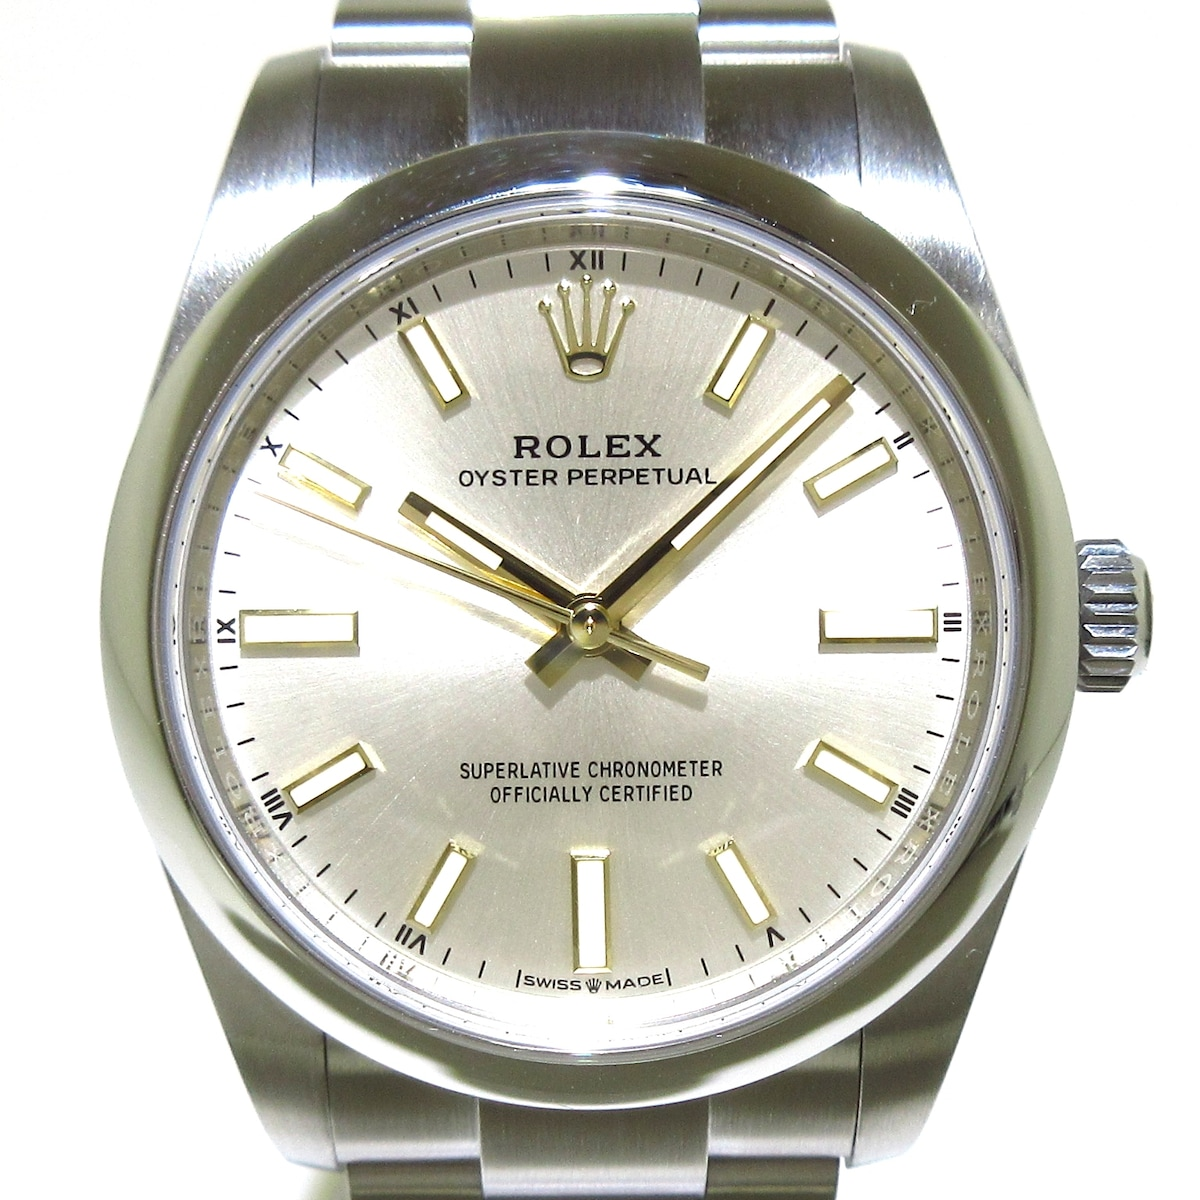 ROLEX(ロレックス)のオイスターパーペチュアル 34